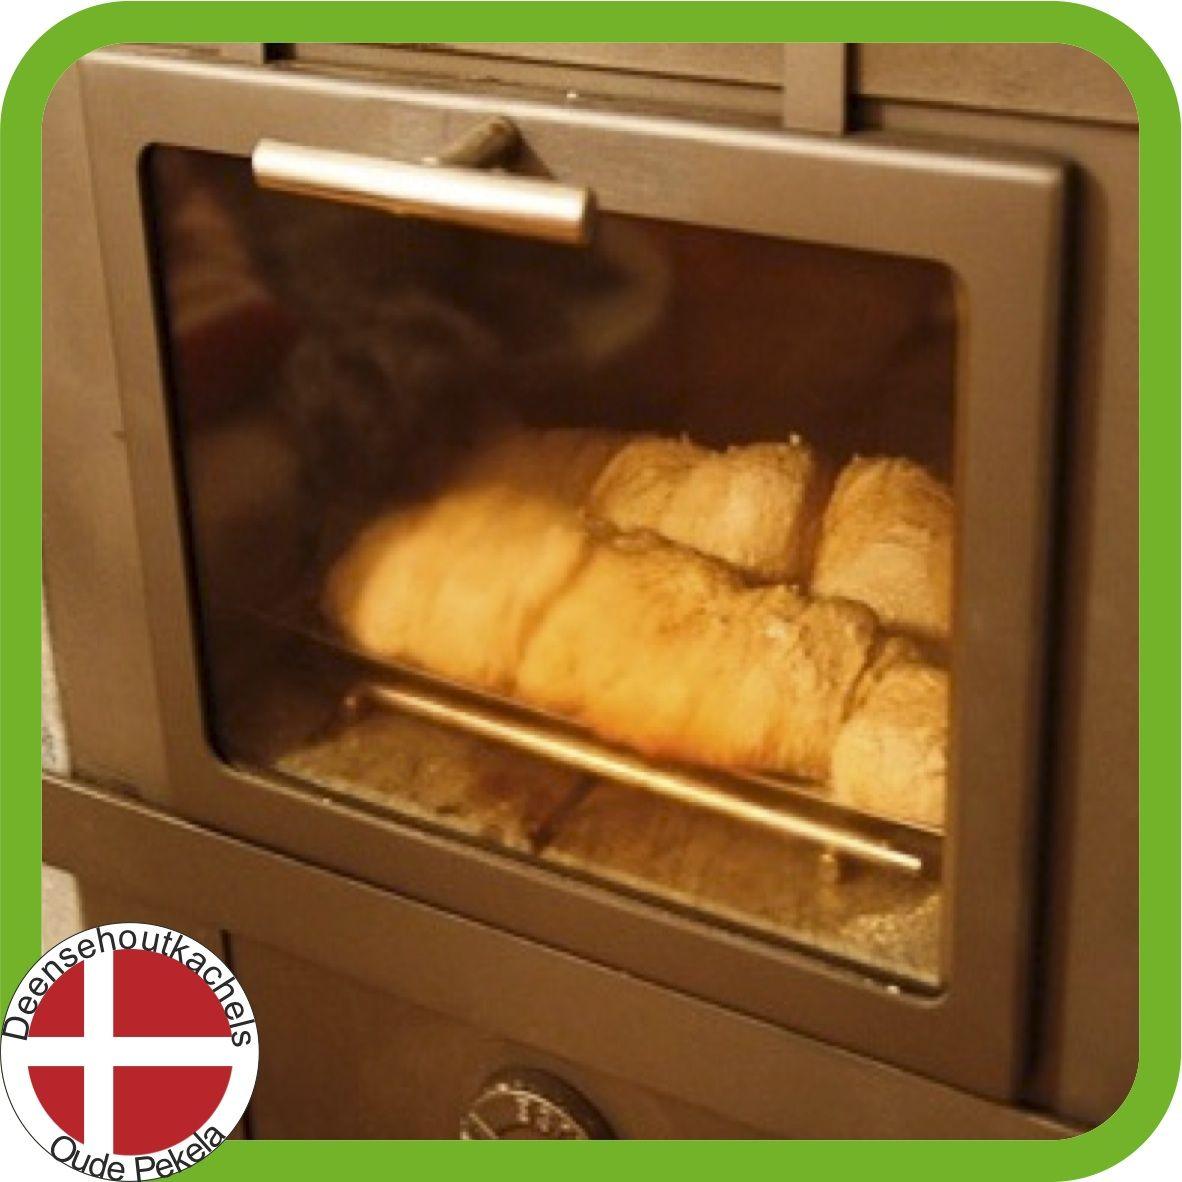 Svendsen 1 houtkachel bakvak / Svendsen woodstove baking section.